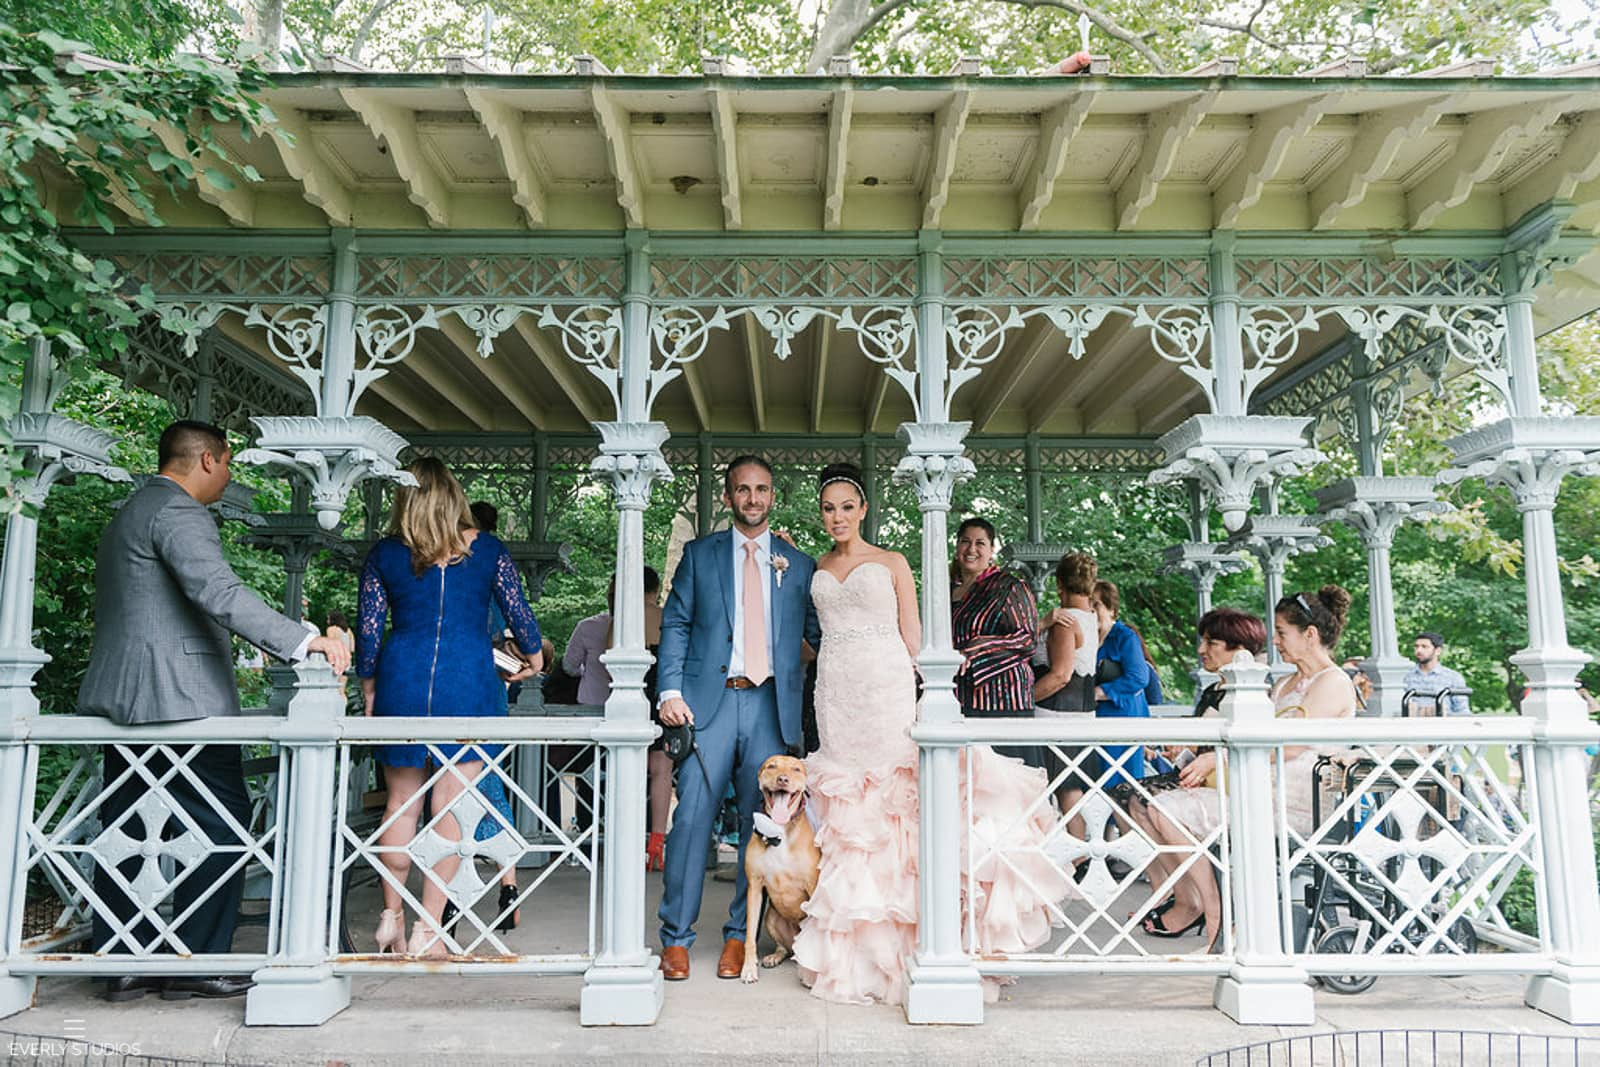 Ladies Pavilion Wedding in Central Park, New York